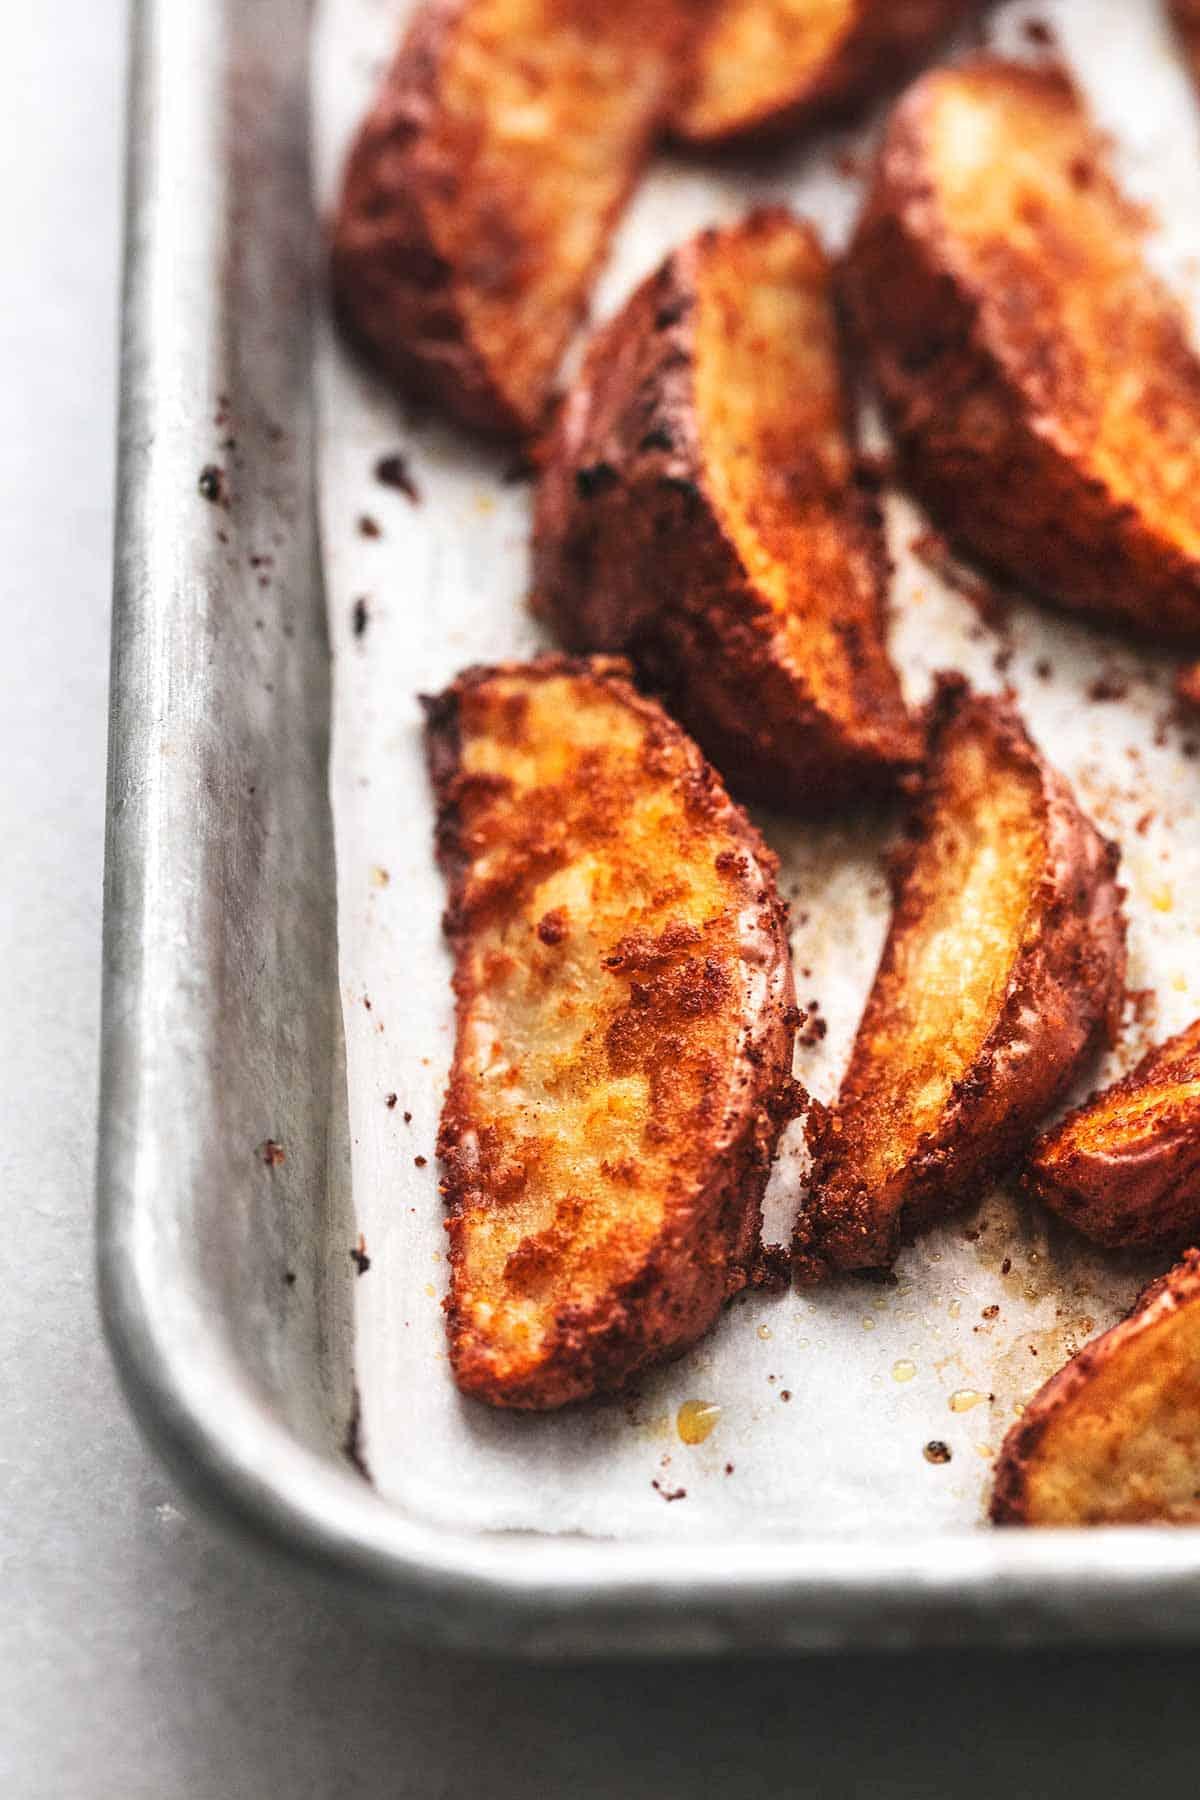 close up view of several seasoned potato wedges on baking sheet